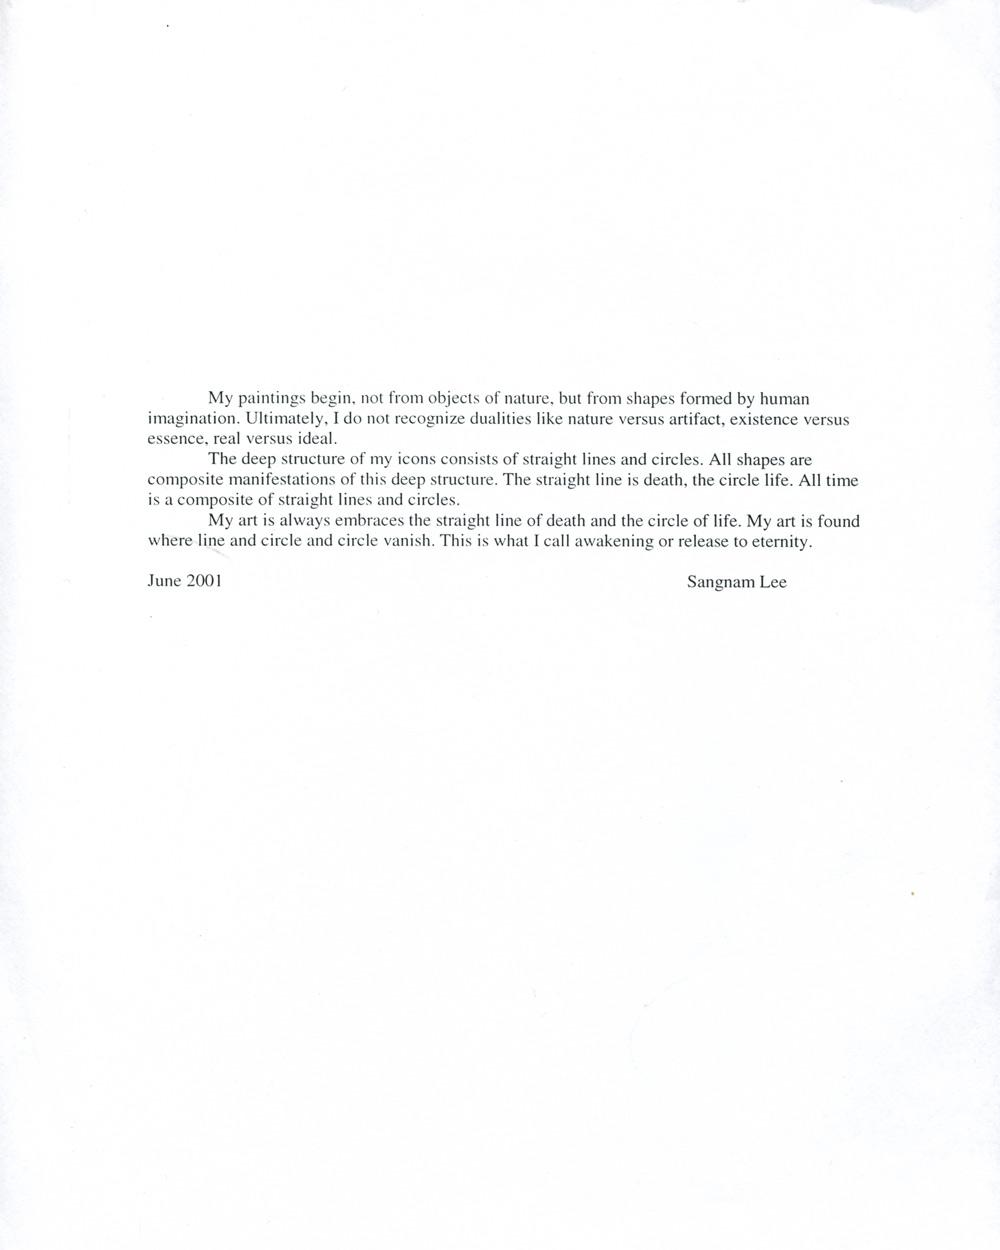 Sang Nam Lee's Artist Statement, June 2001